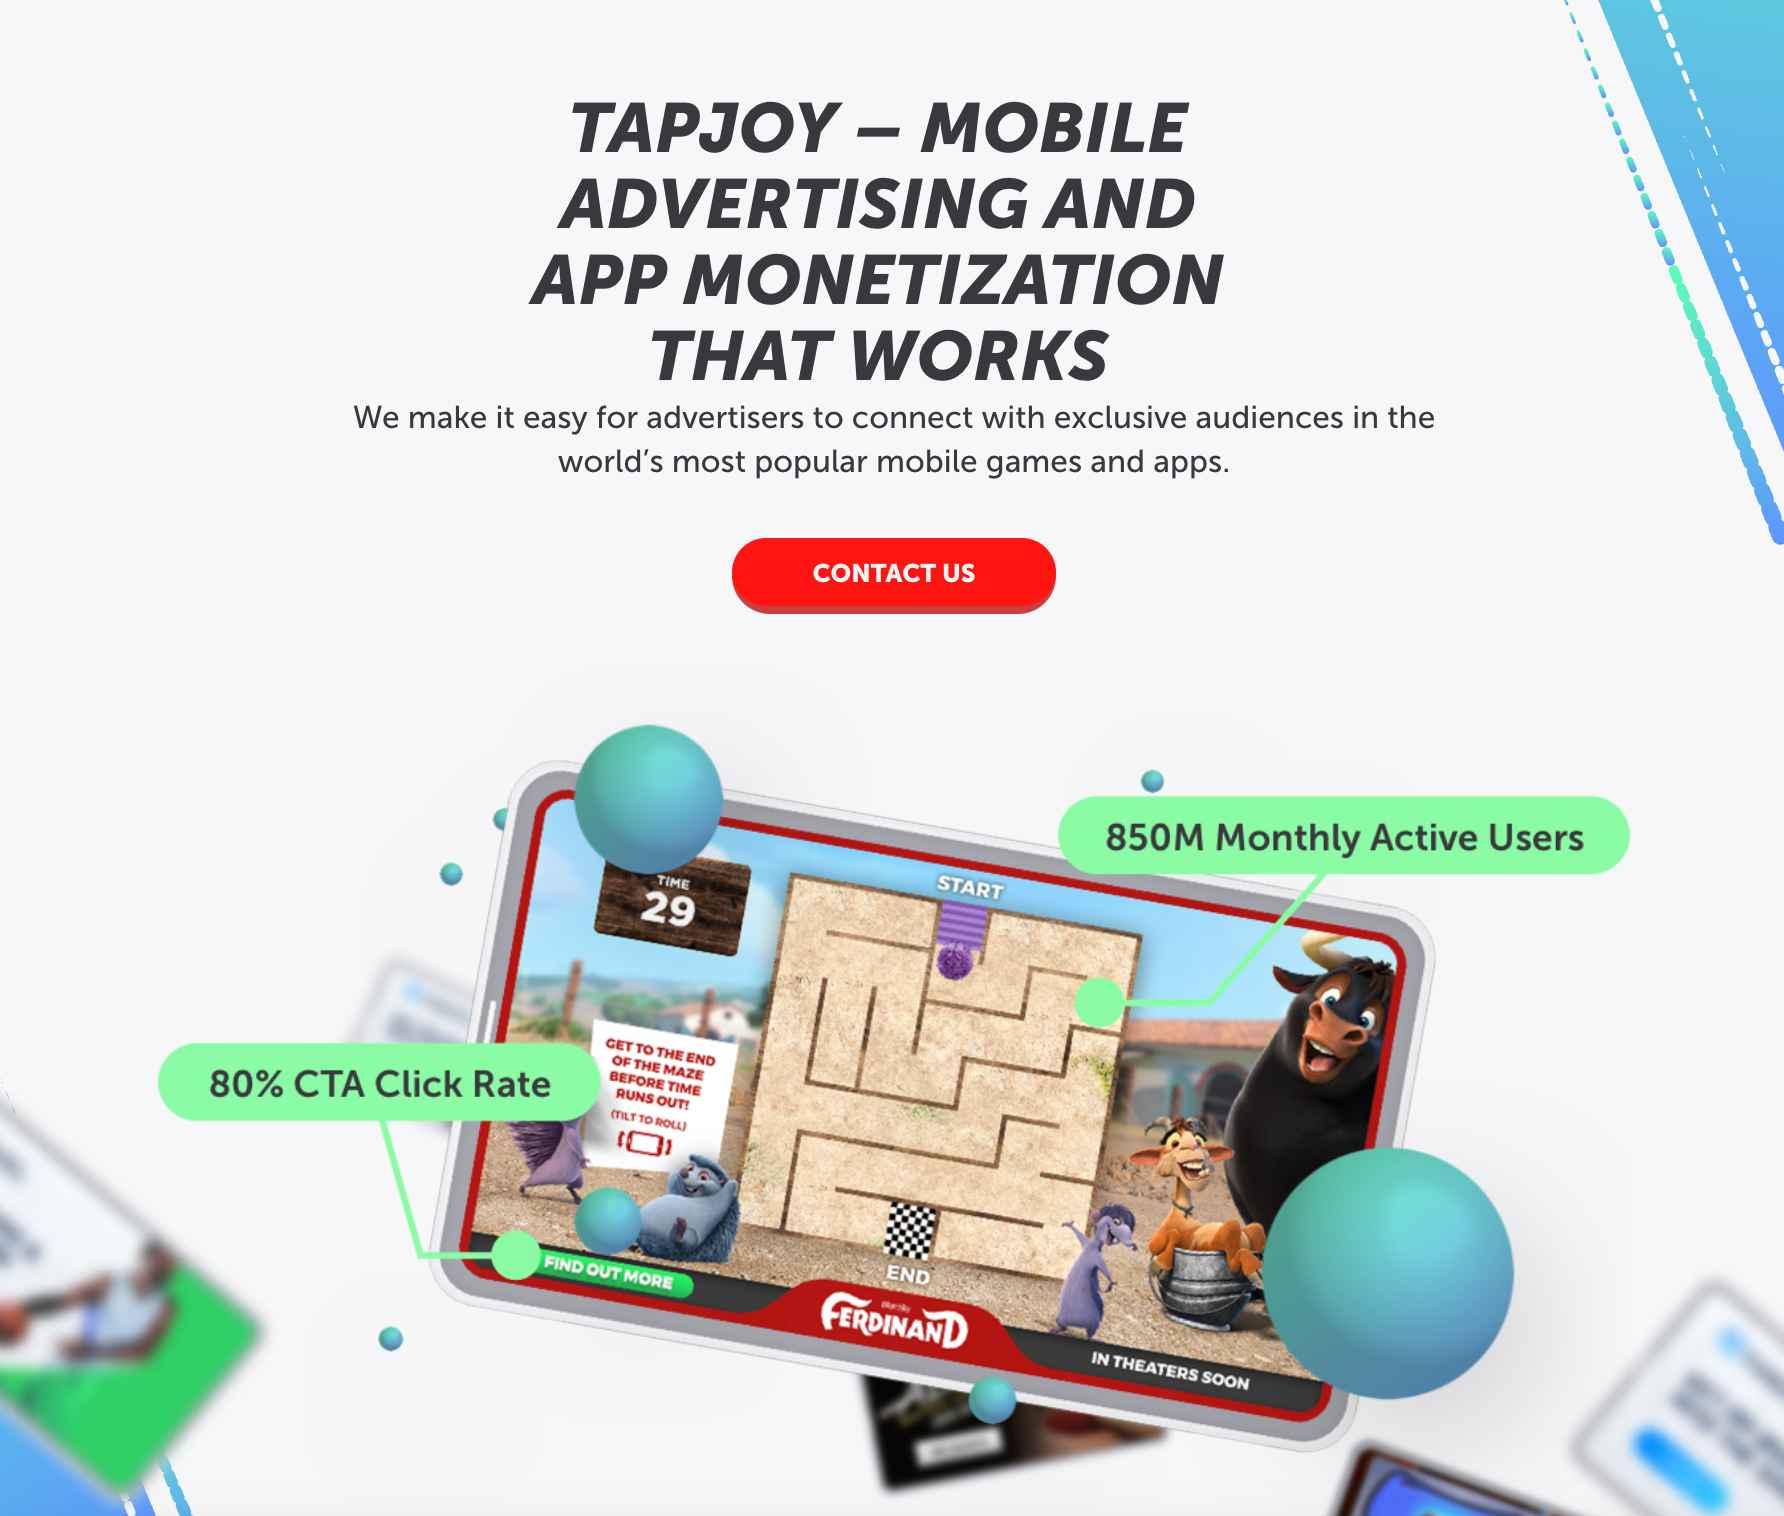 Marketing Software: TapJoy